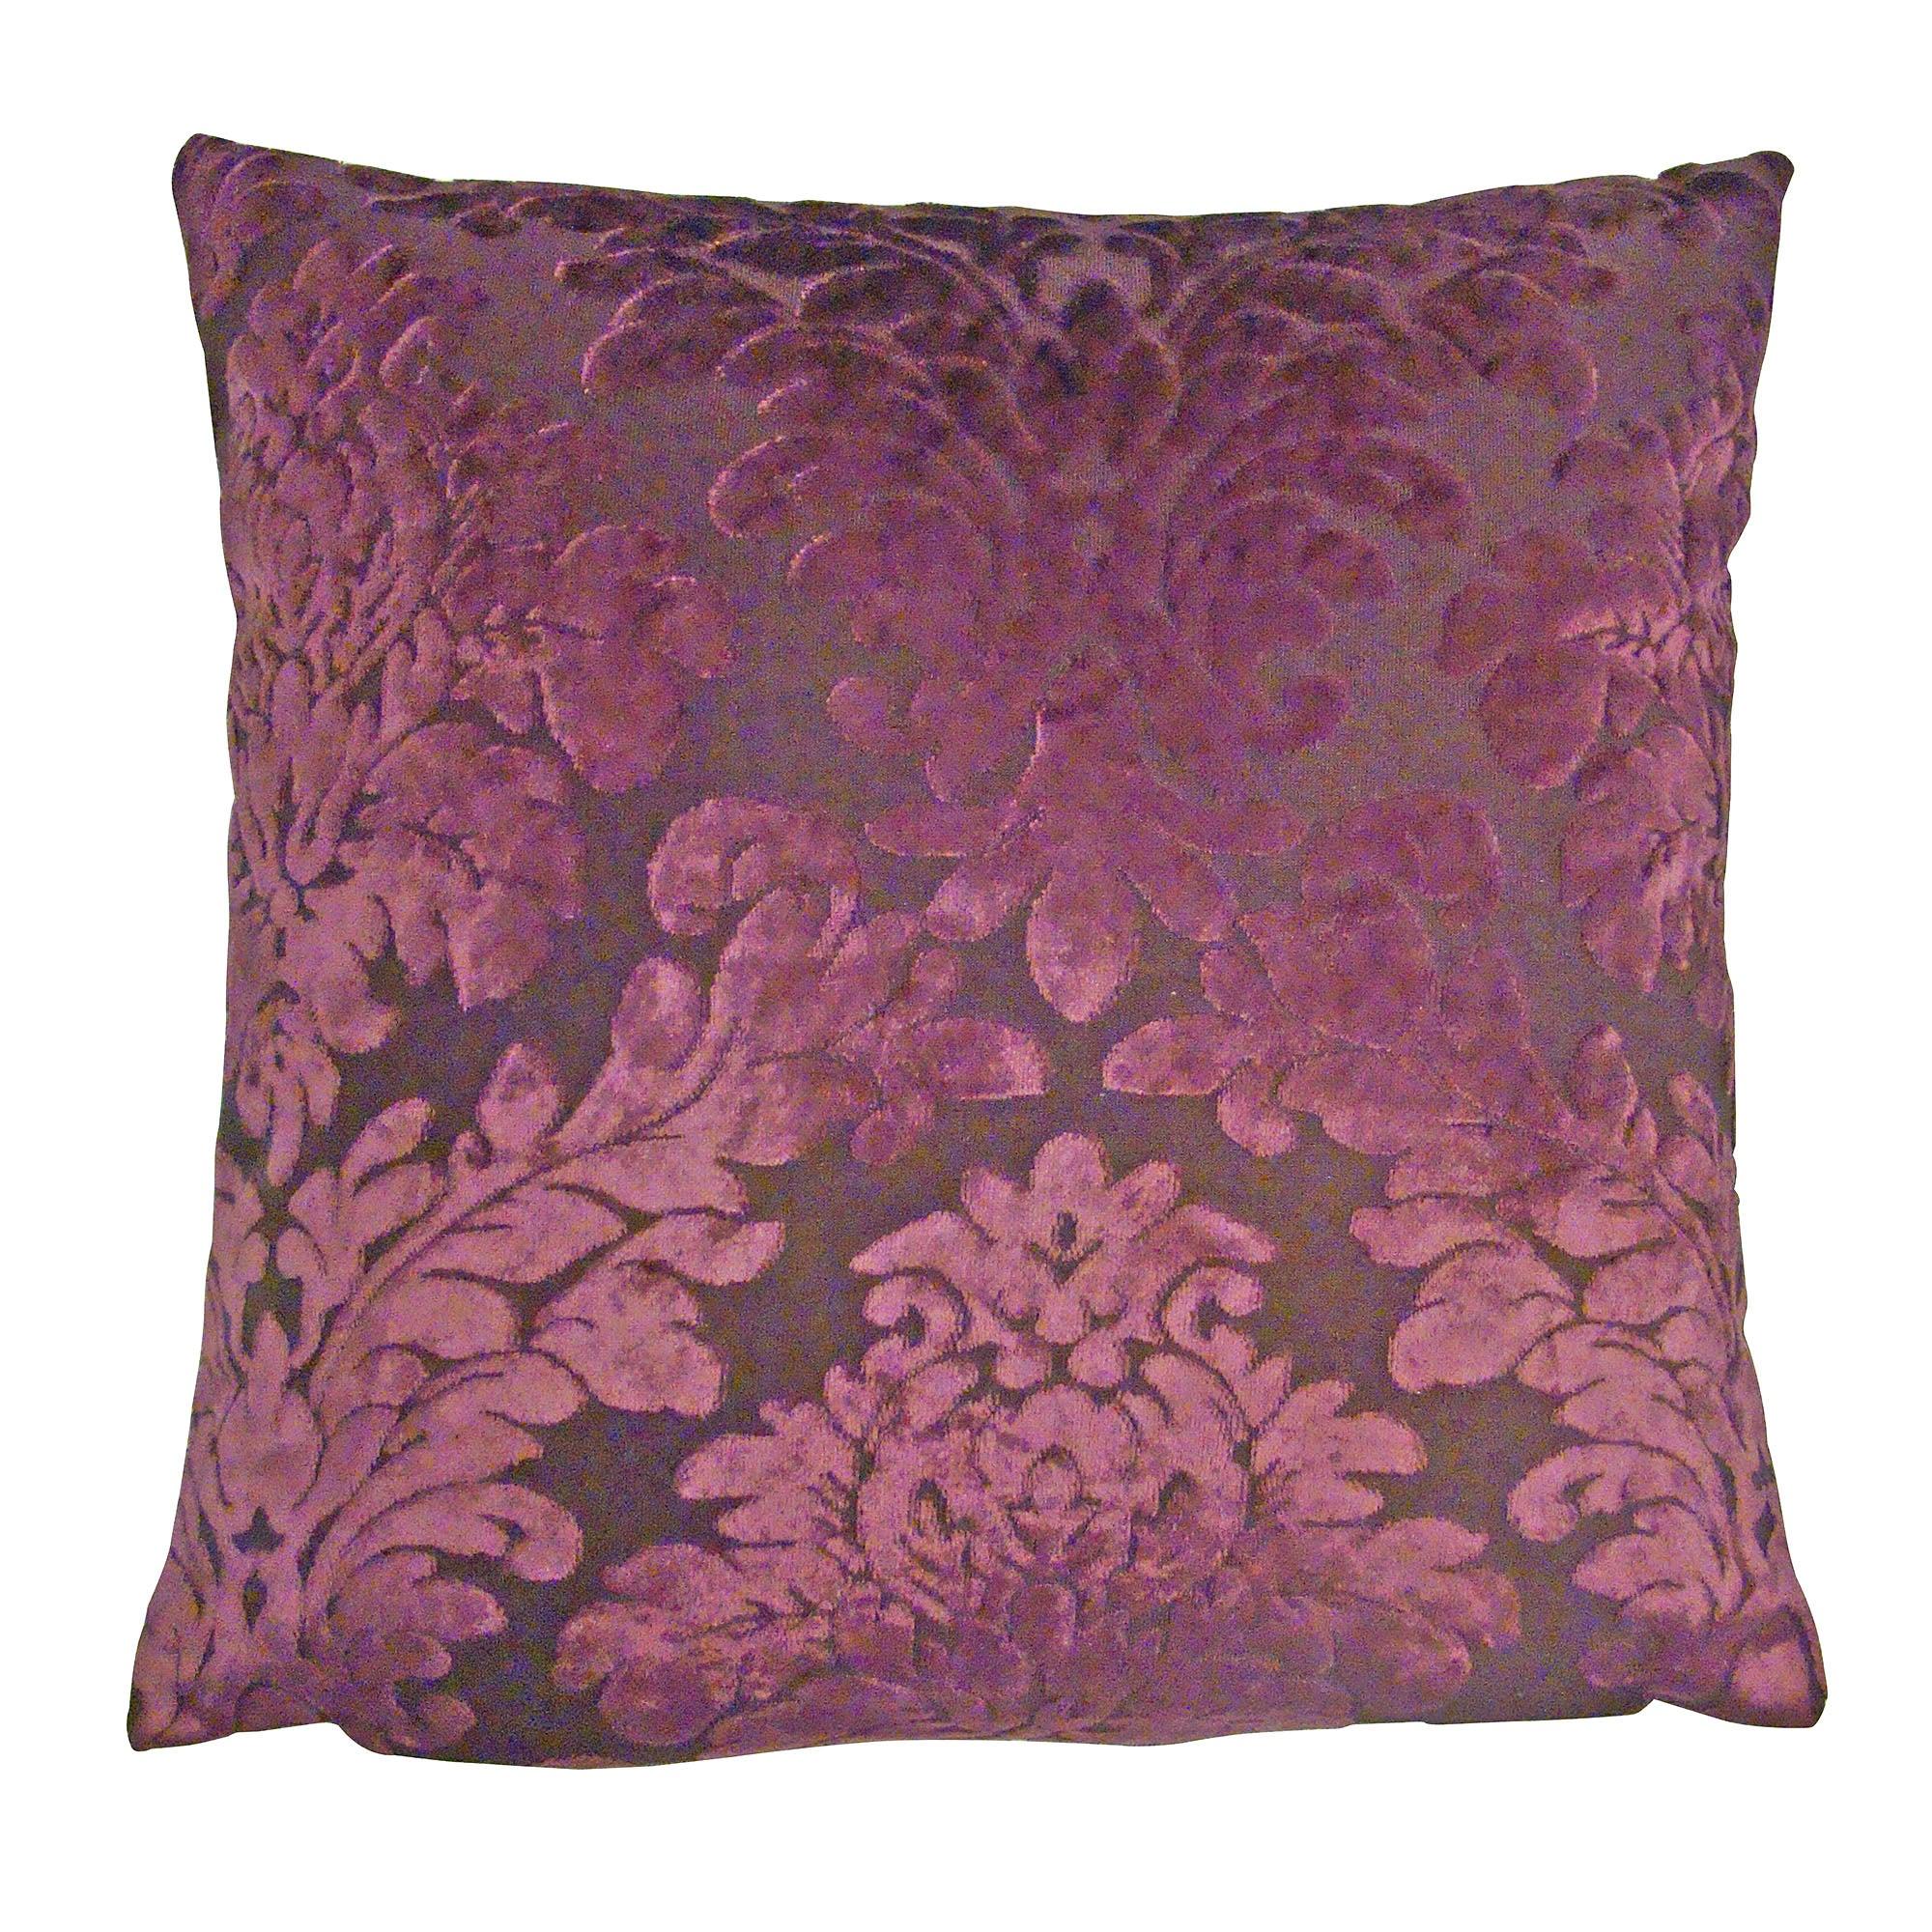 Plum Genoa Cushion Cover